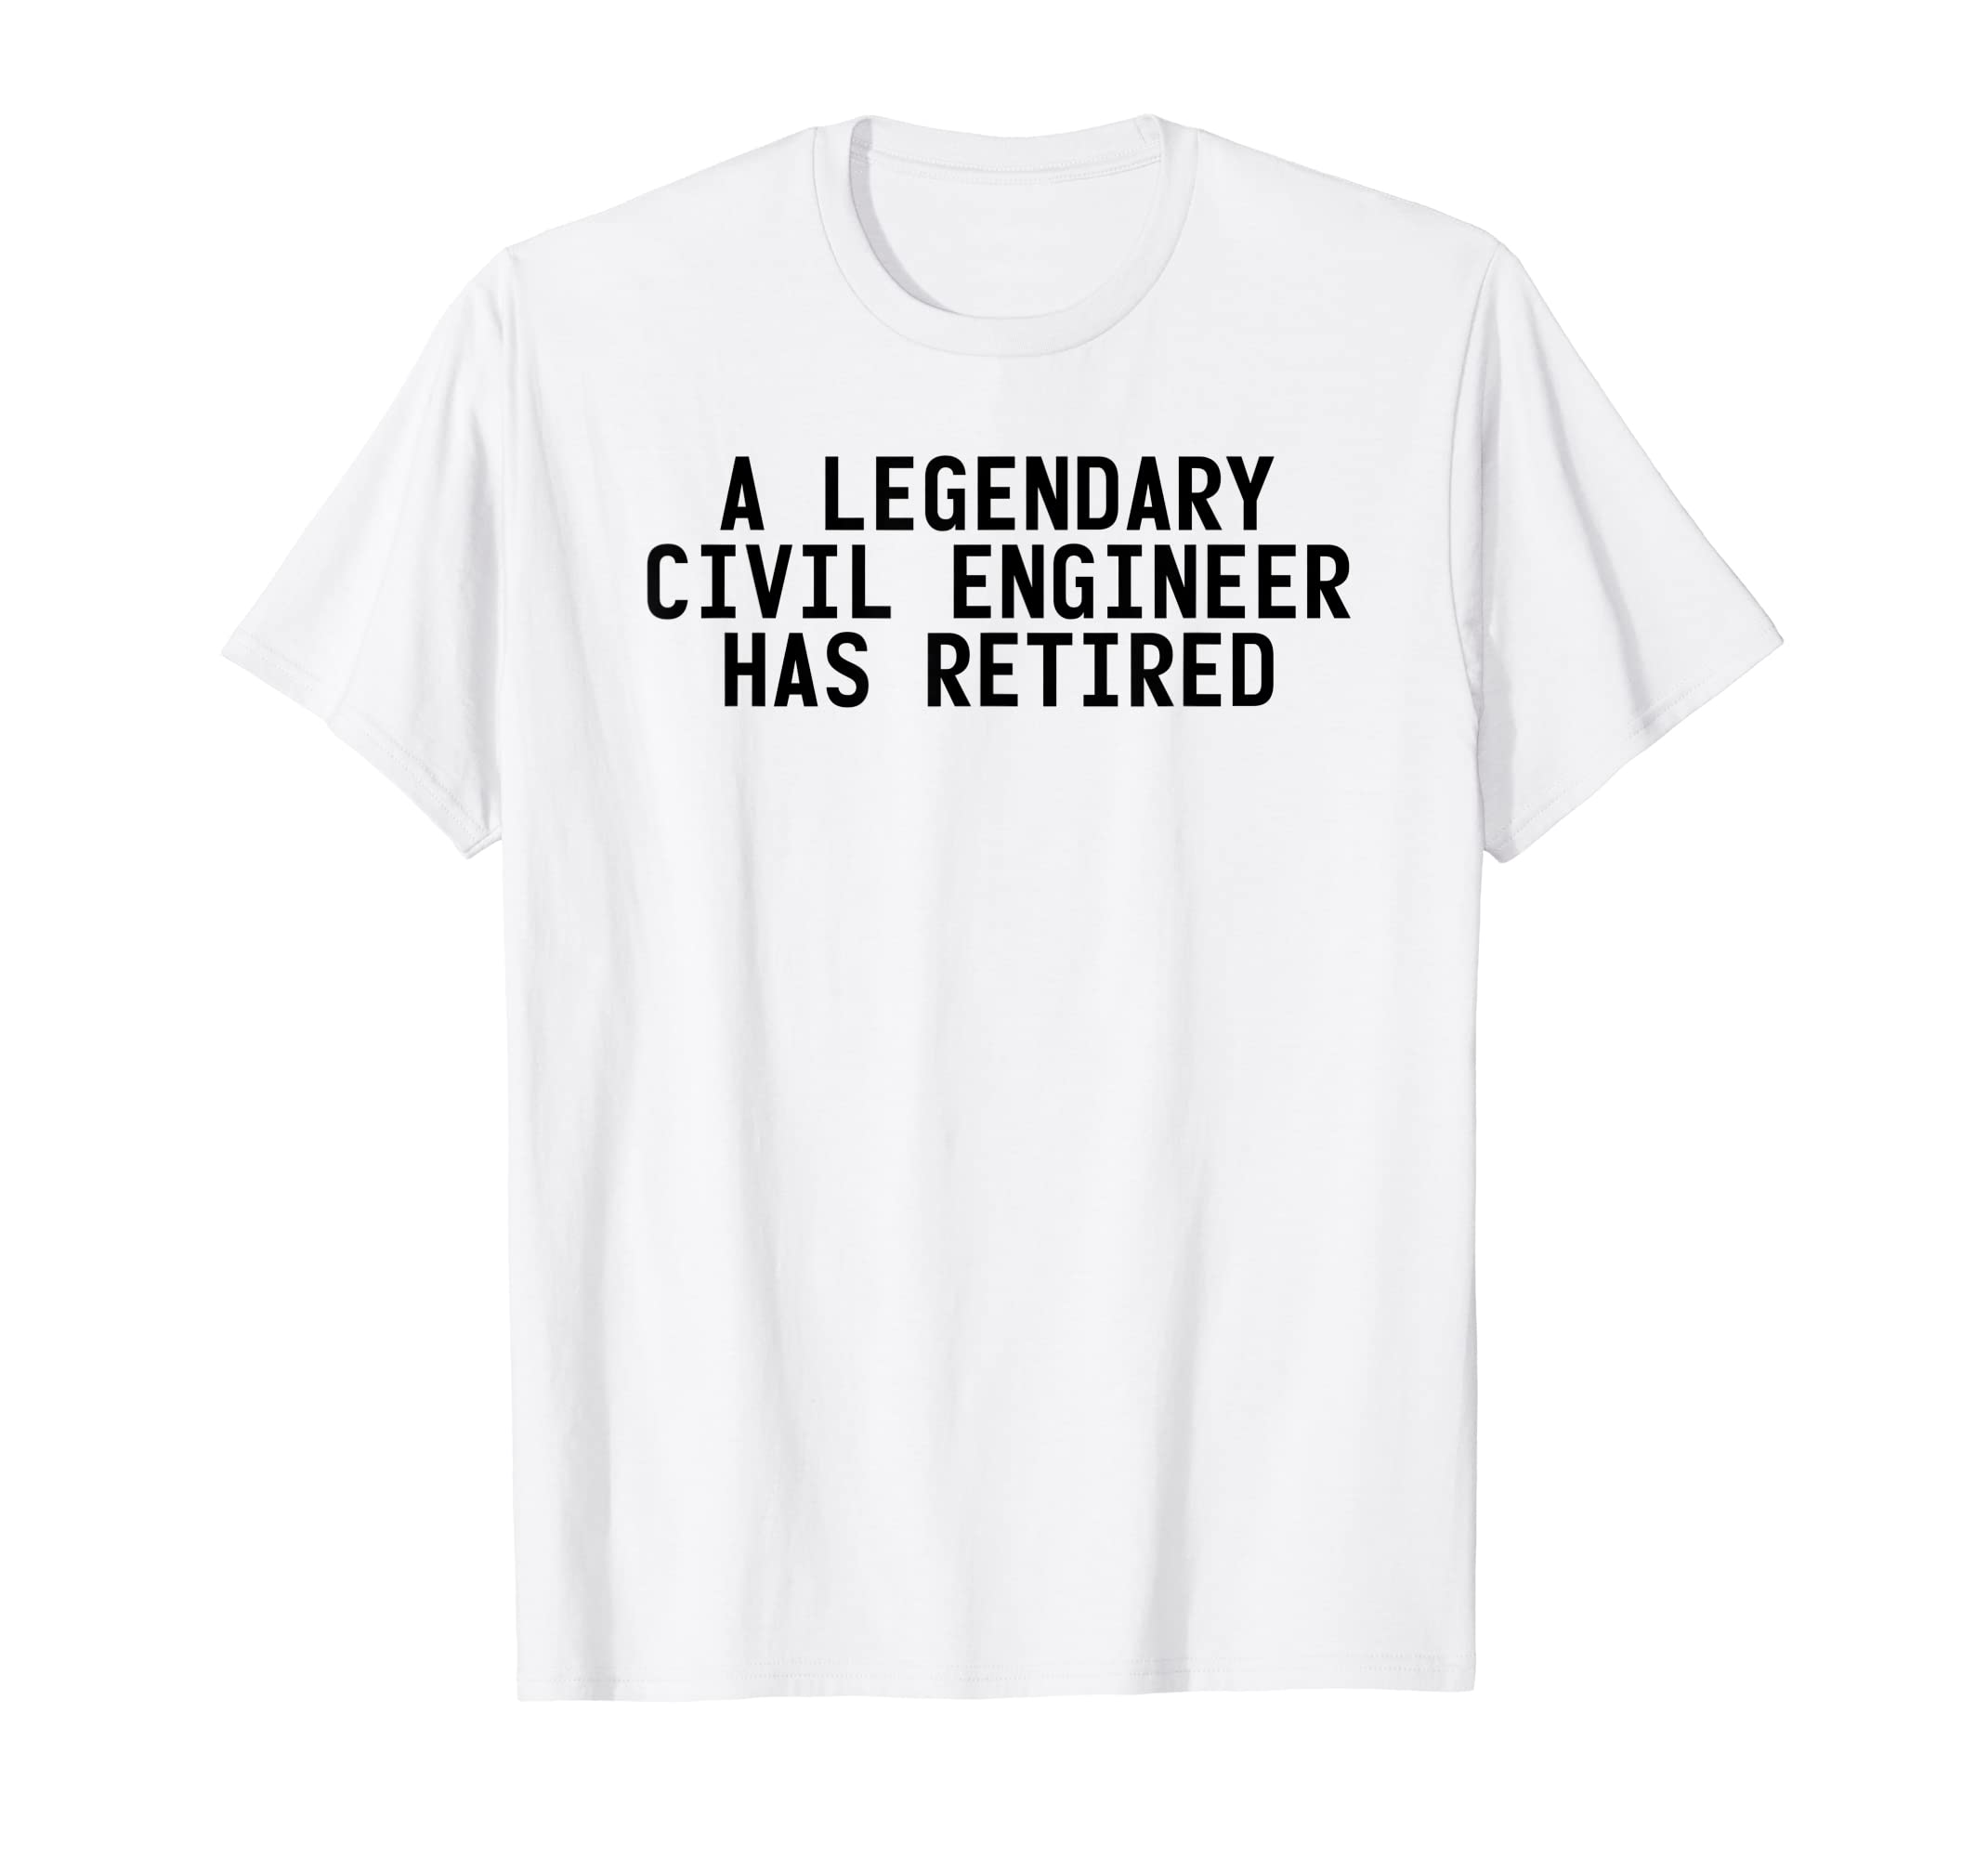 b05d8ea3 Amazon.com: LEGENDARY CIVIL ENGINEER HAS RETIRED Funny Retirement Gift:  Clothing